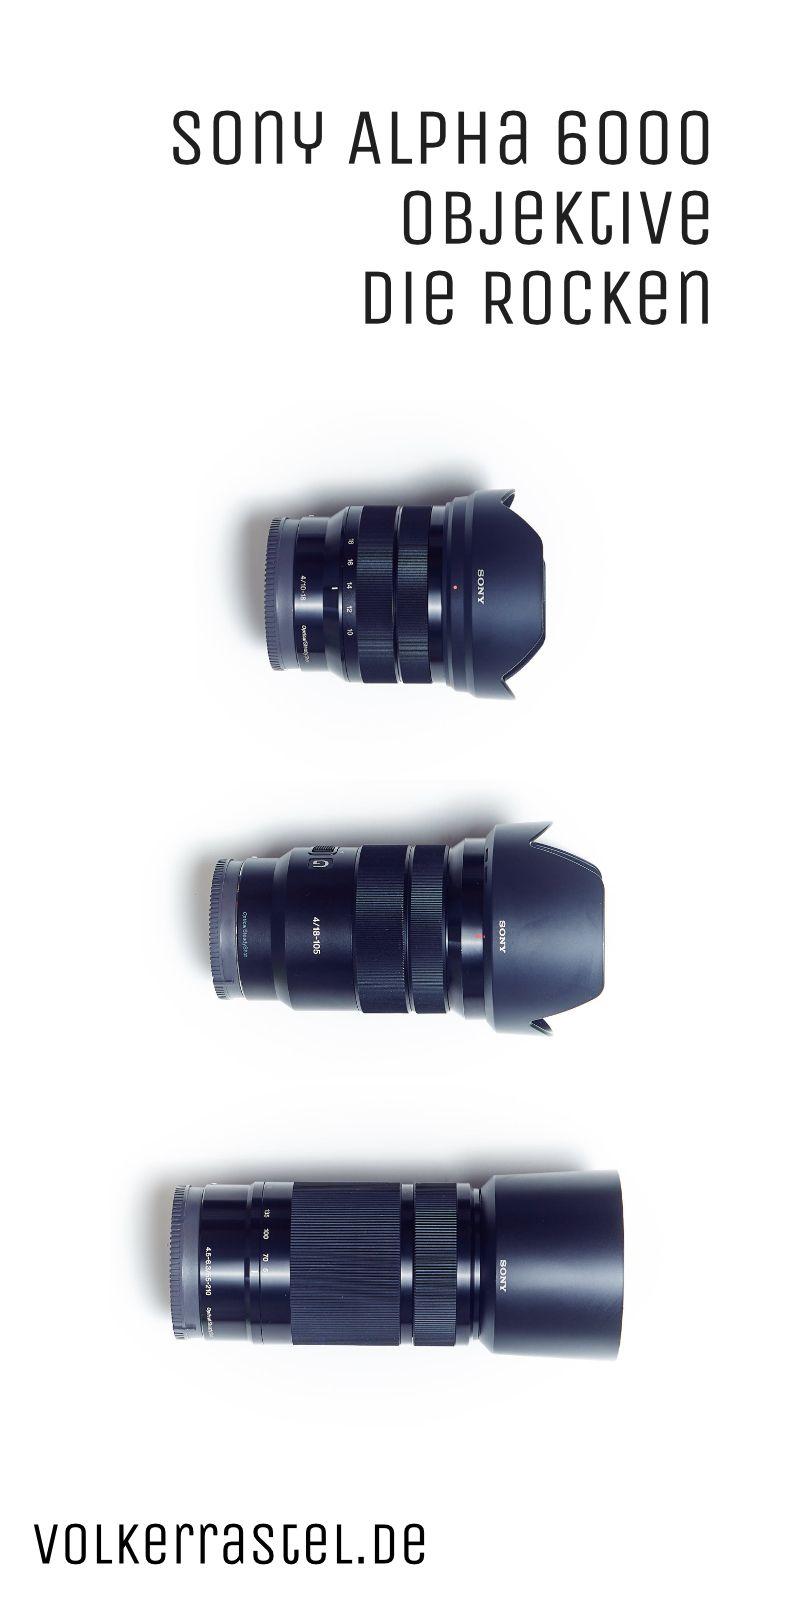 Top Sony Alpha 6000 Objektive In 2020 Objektive Sony Systemkamera